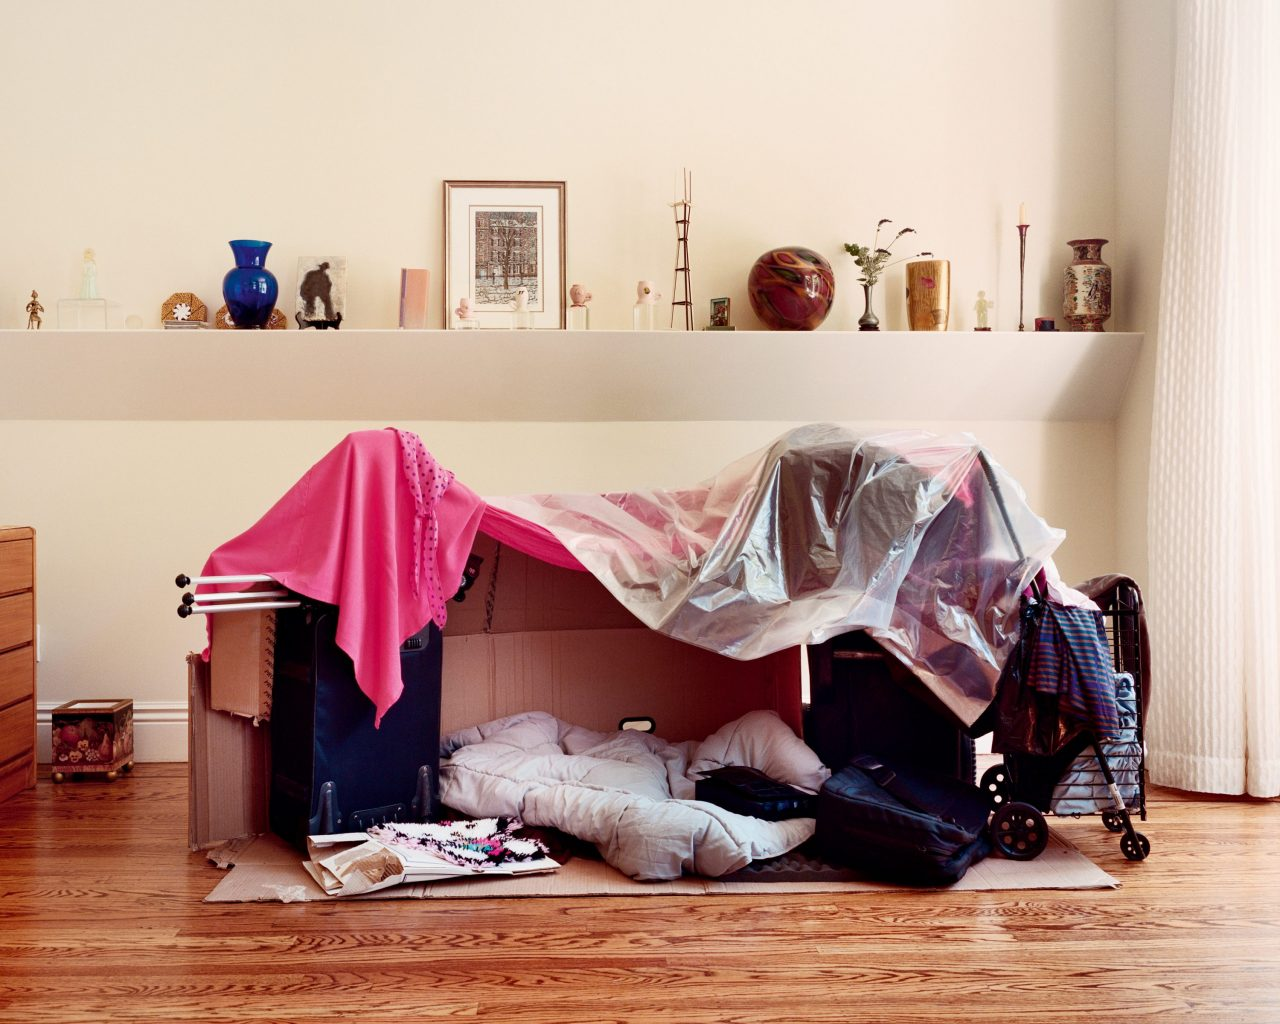 Temporary shelter in living room